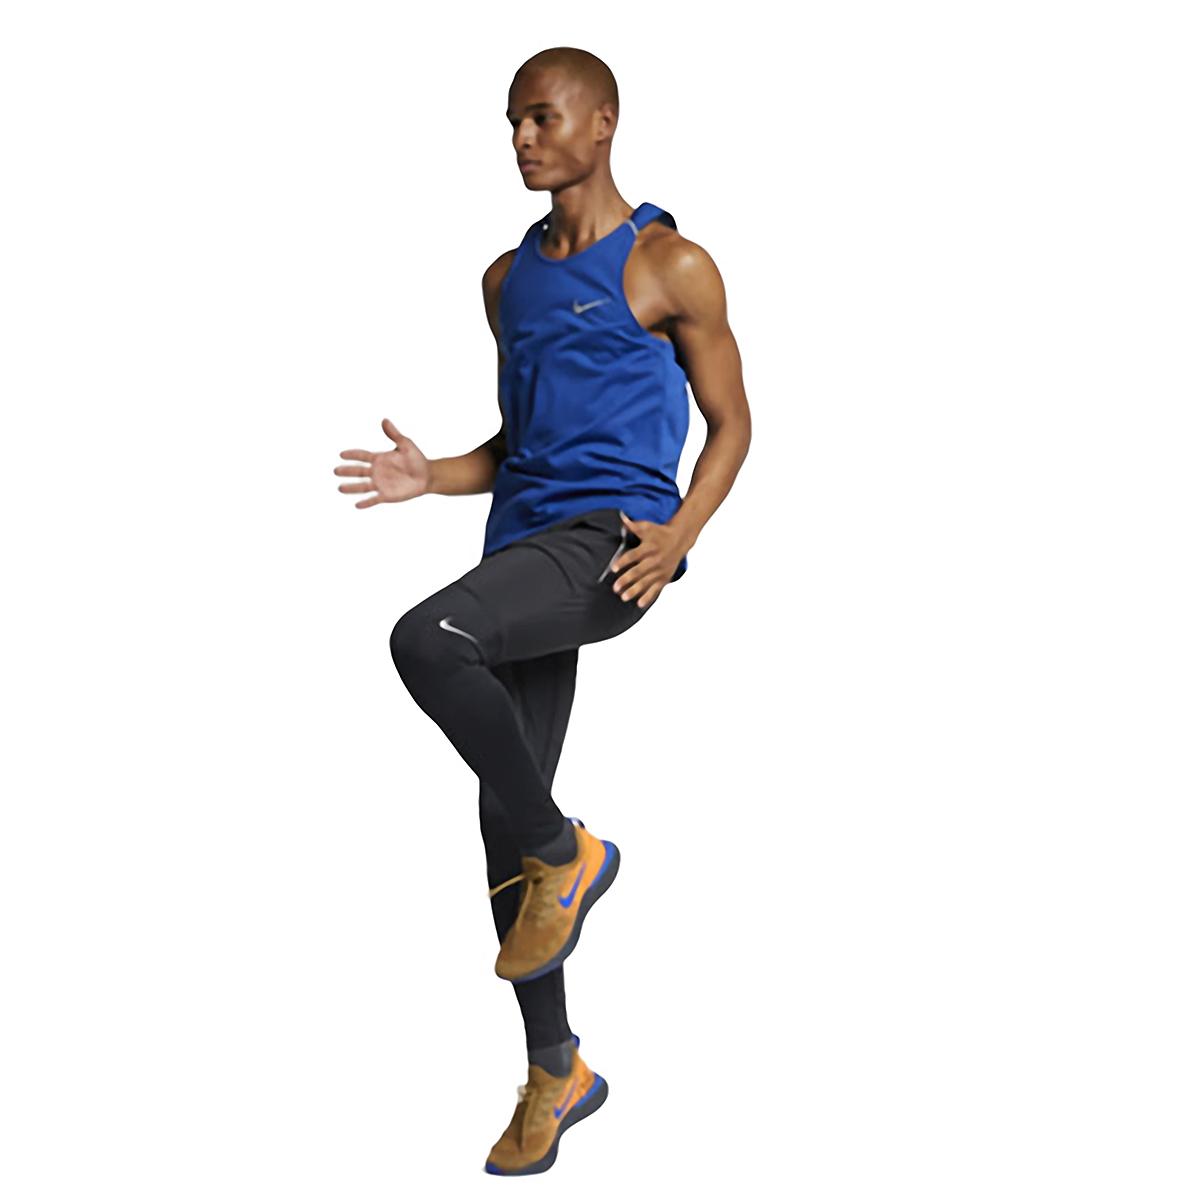 Men's Nike Breathe Rise 365 Tank  - Color: Indigo Force/Reflective  - Size: M, Indigo Force/Reflective, large, image 2